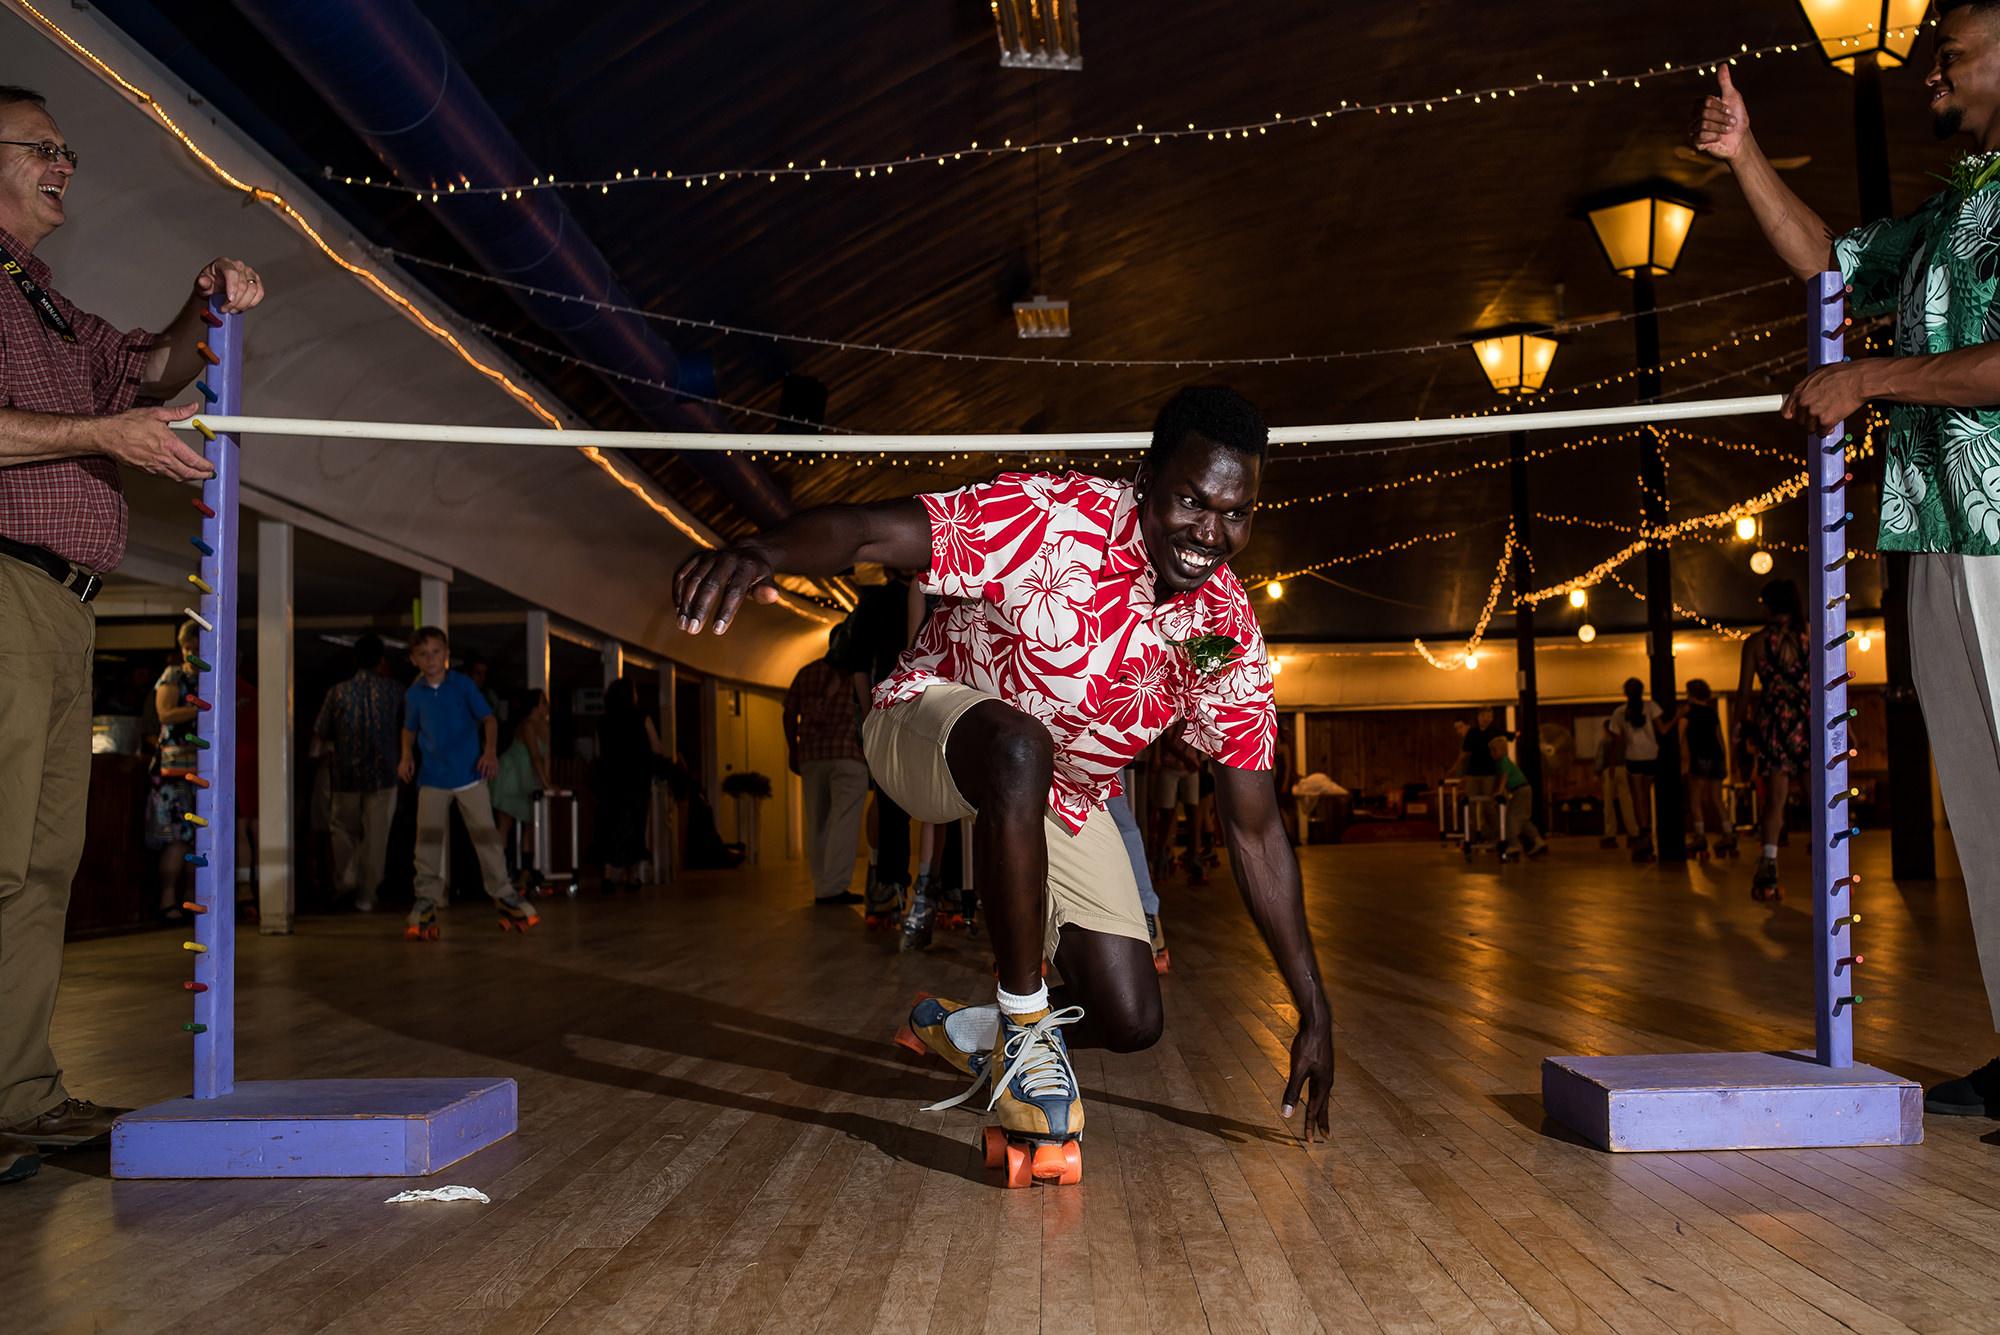 roller skating at wedding in iowa.jpg